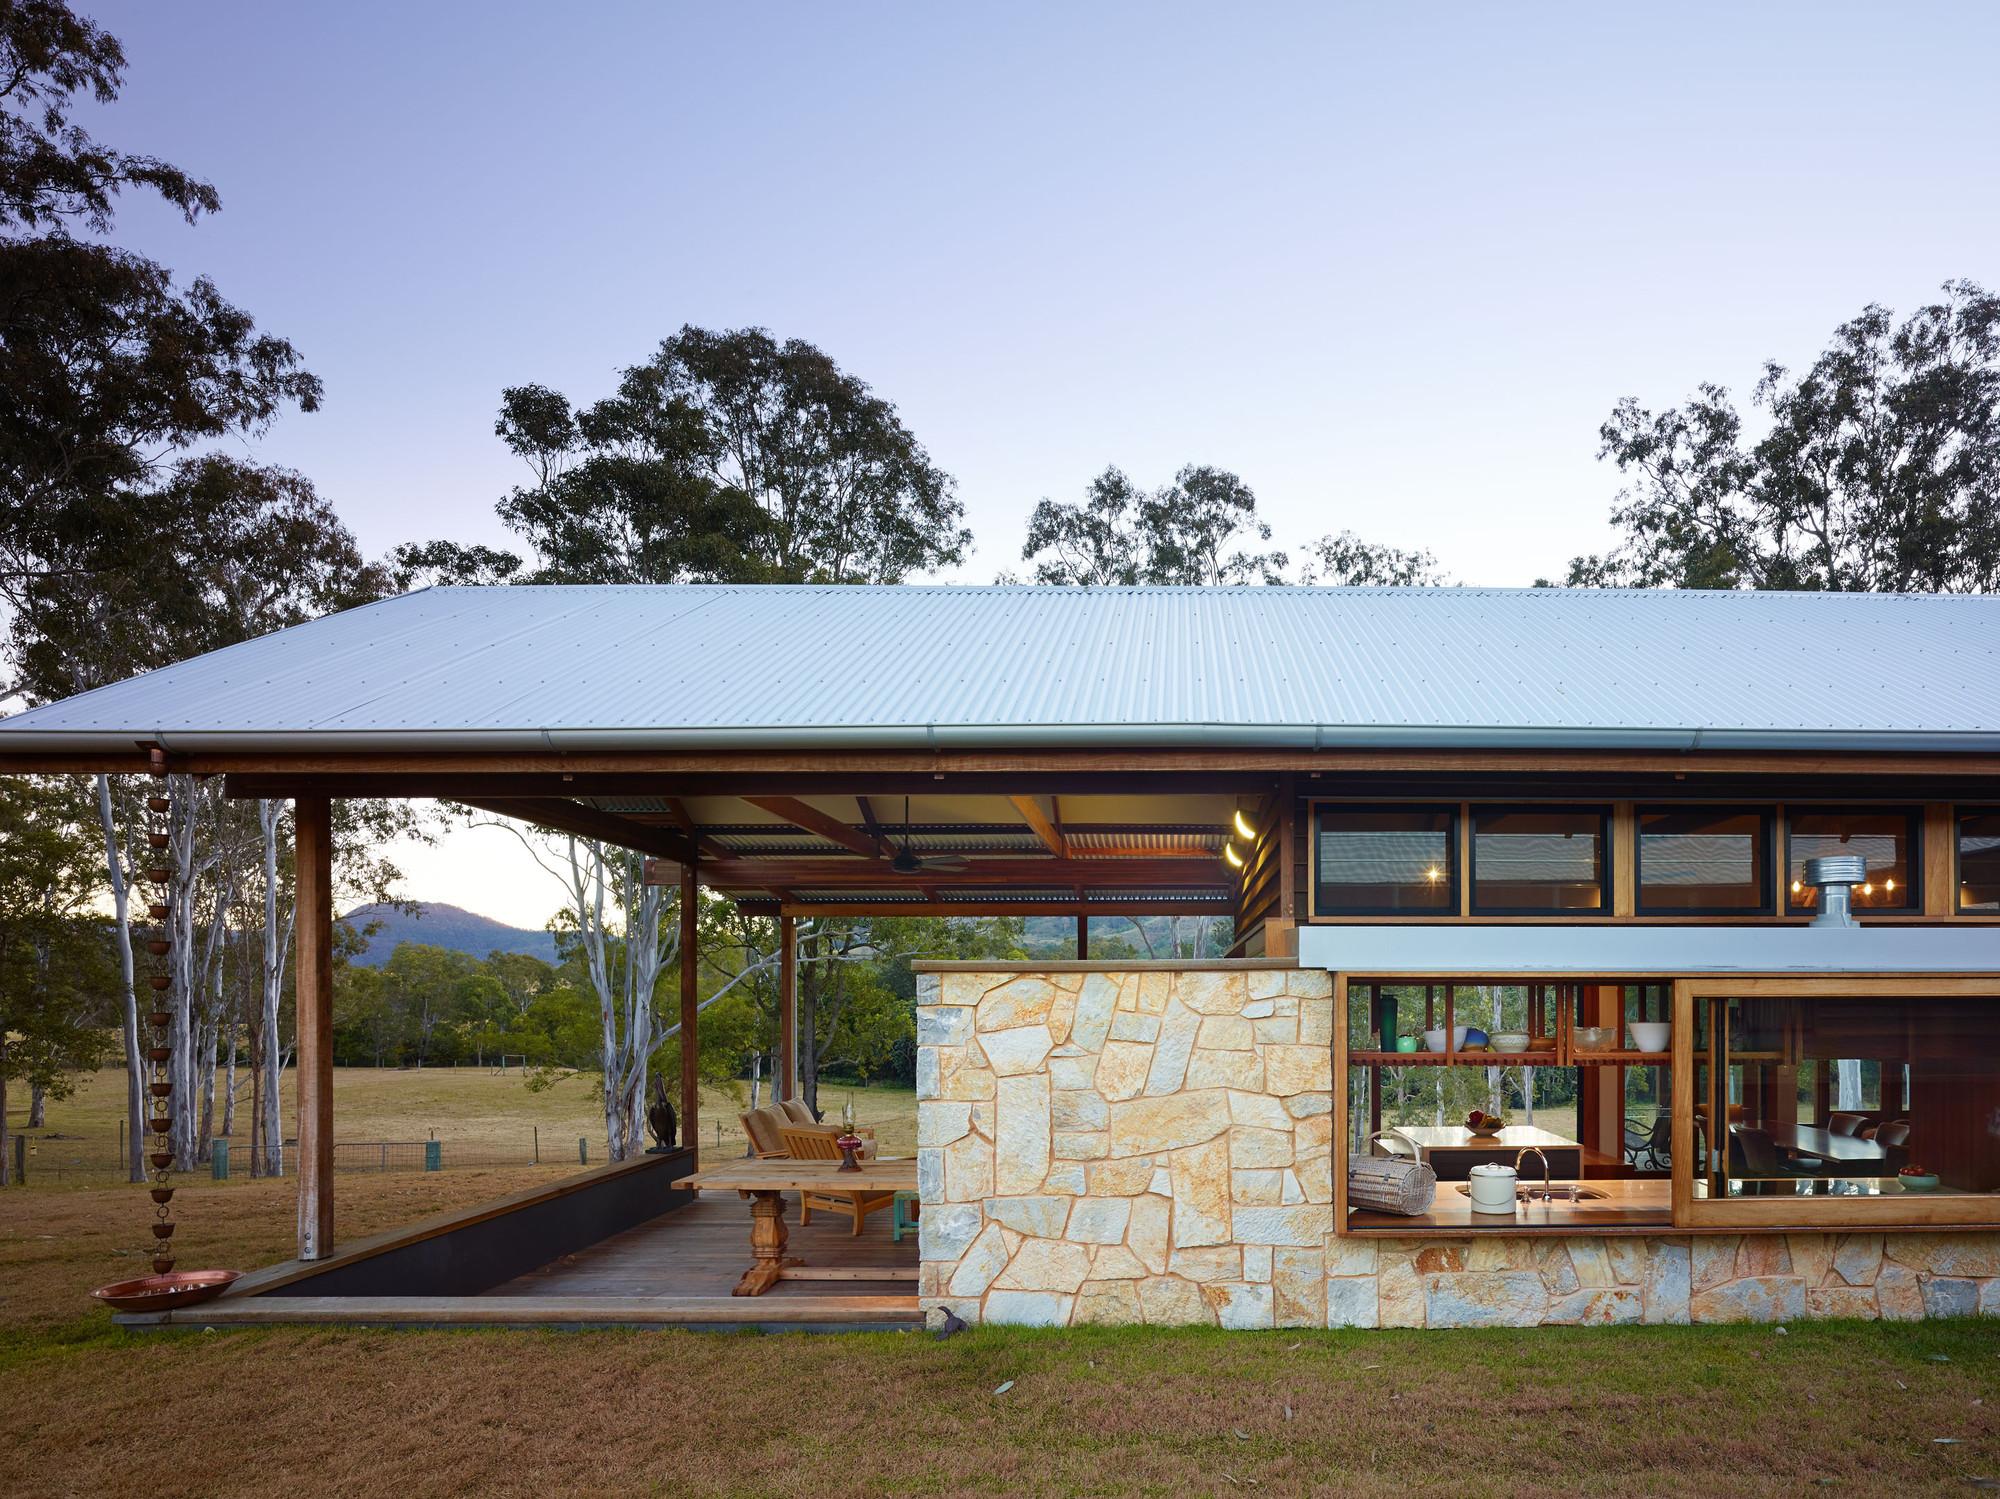 Hinterland House Captures The Spirit of Rural Australian Style